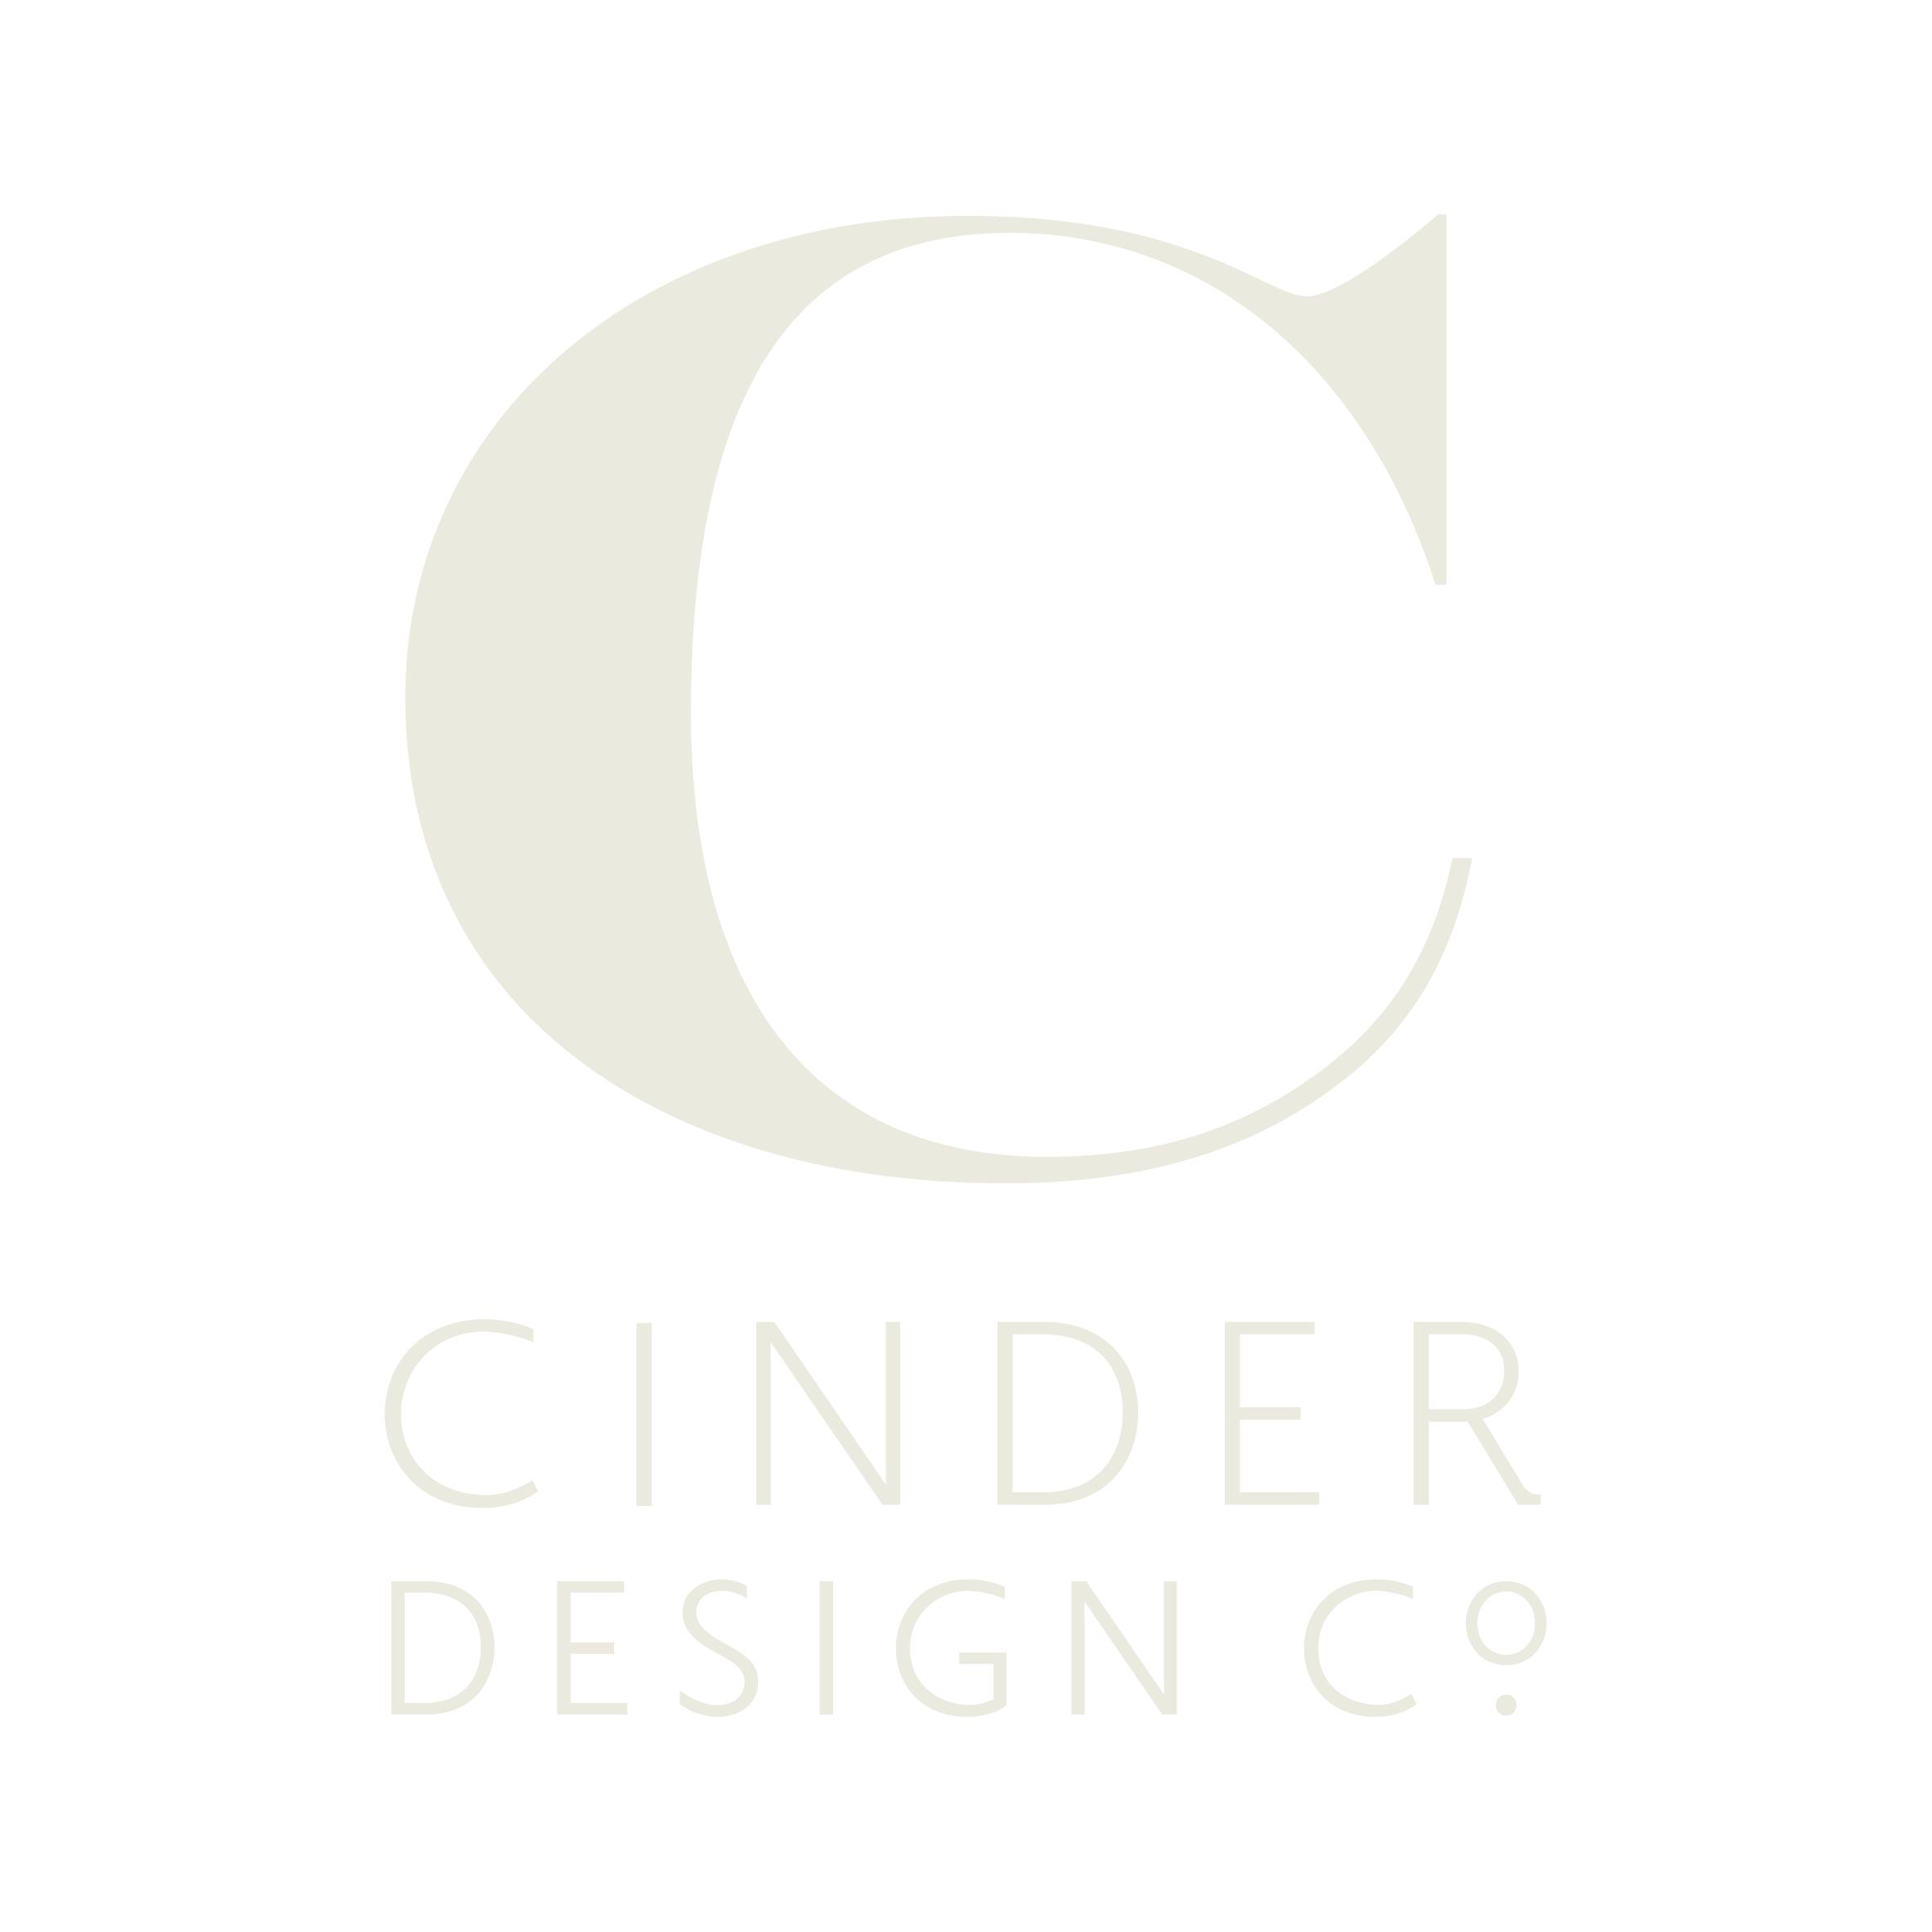 Cinder Design Co. Identity